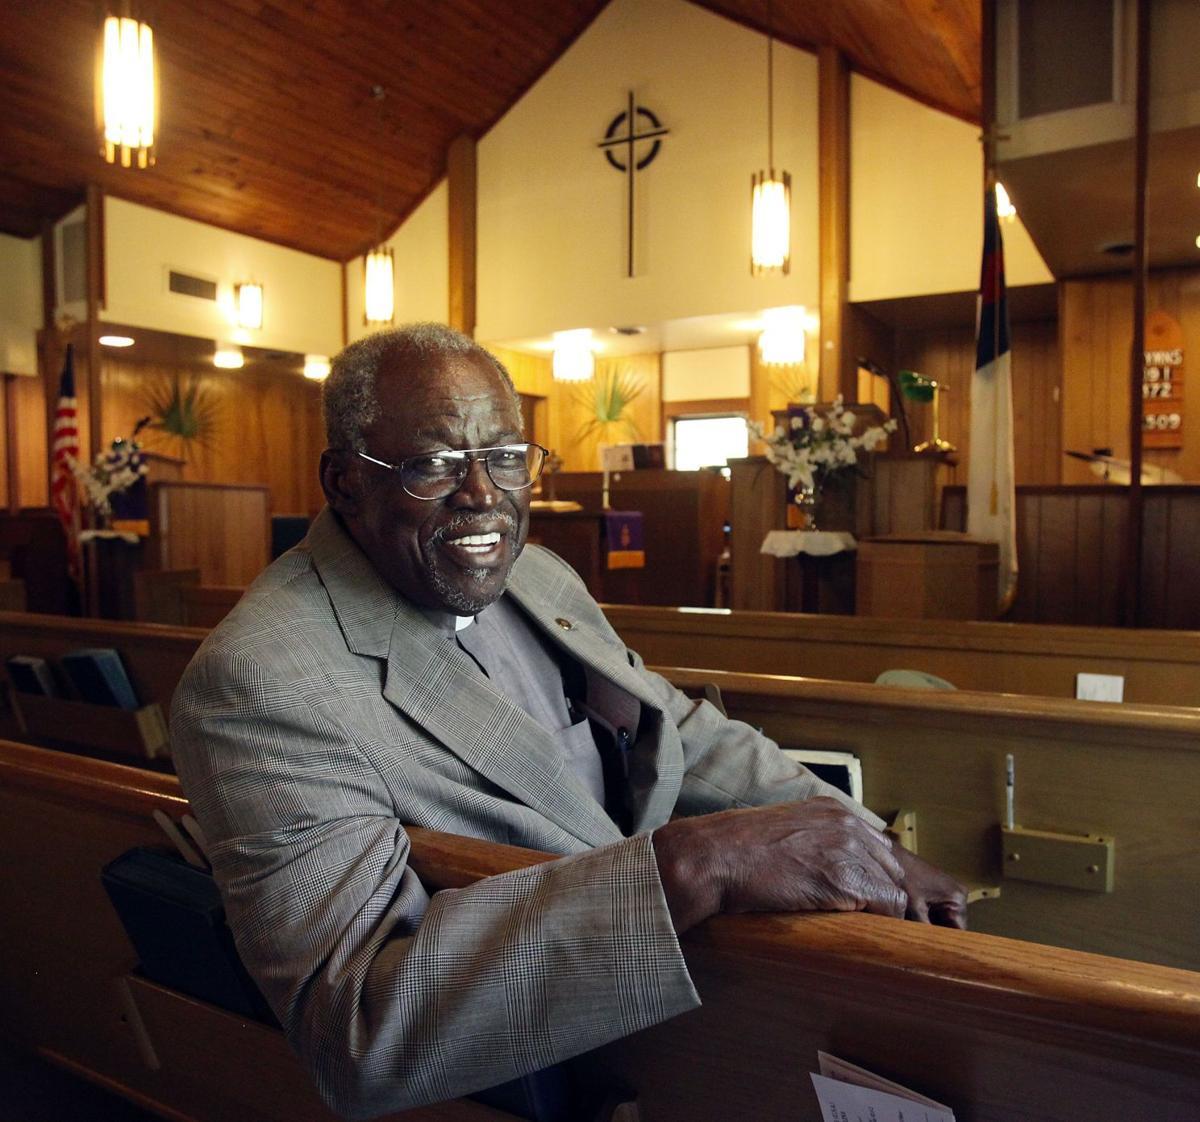 Half-century a pastor